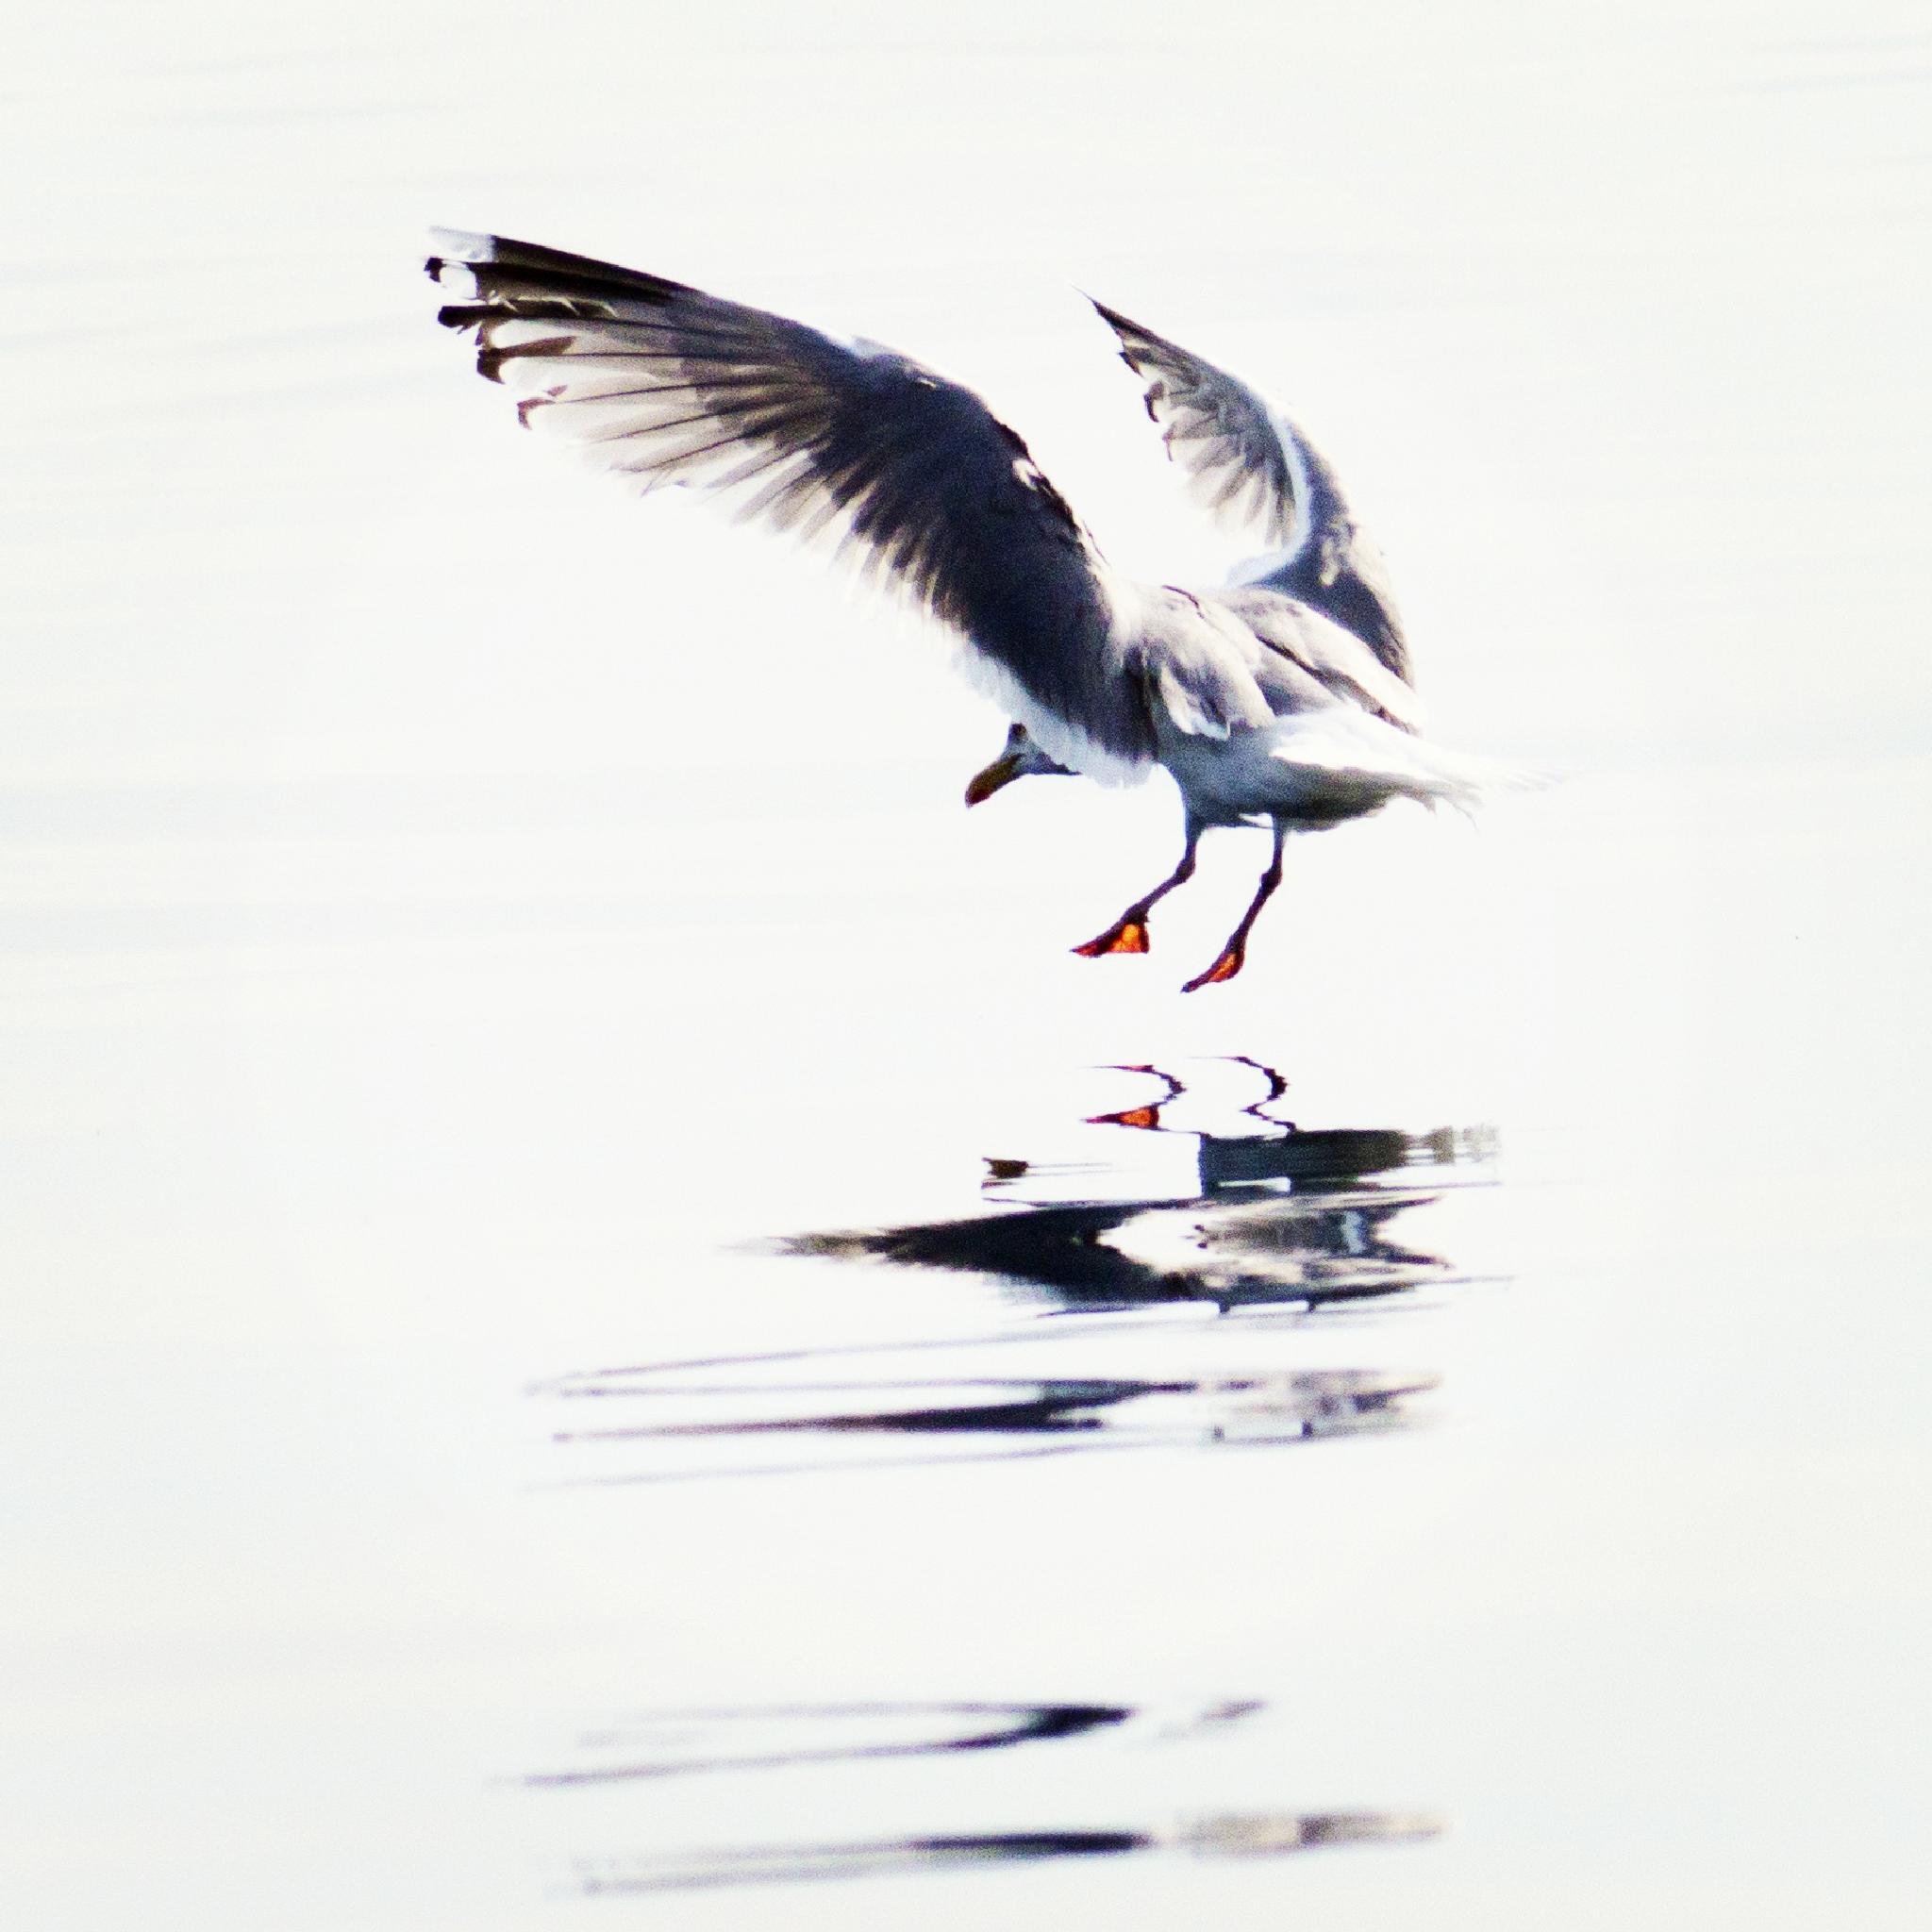 Landing seagull by Maria Johansson